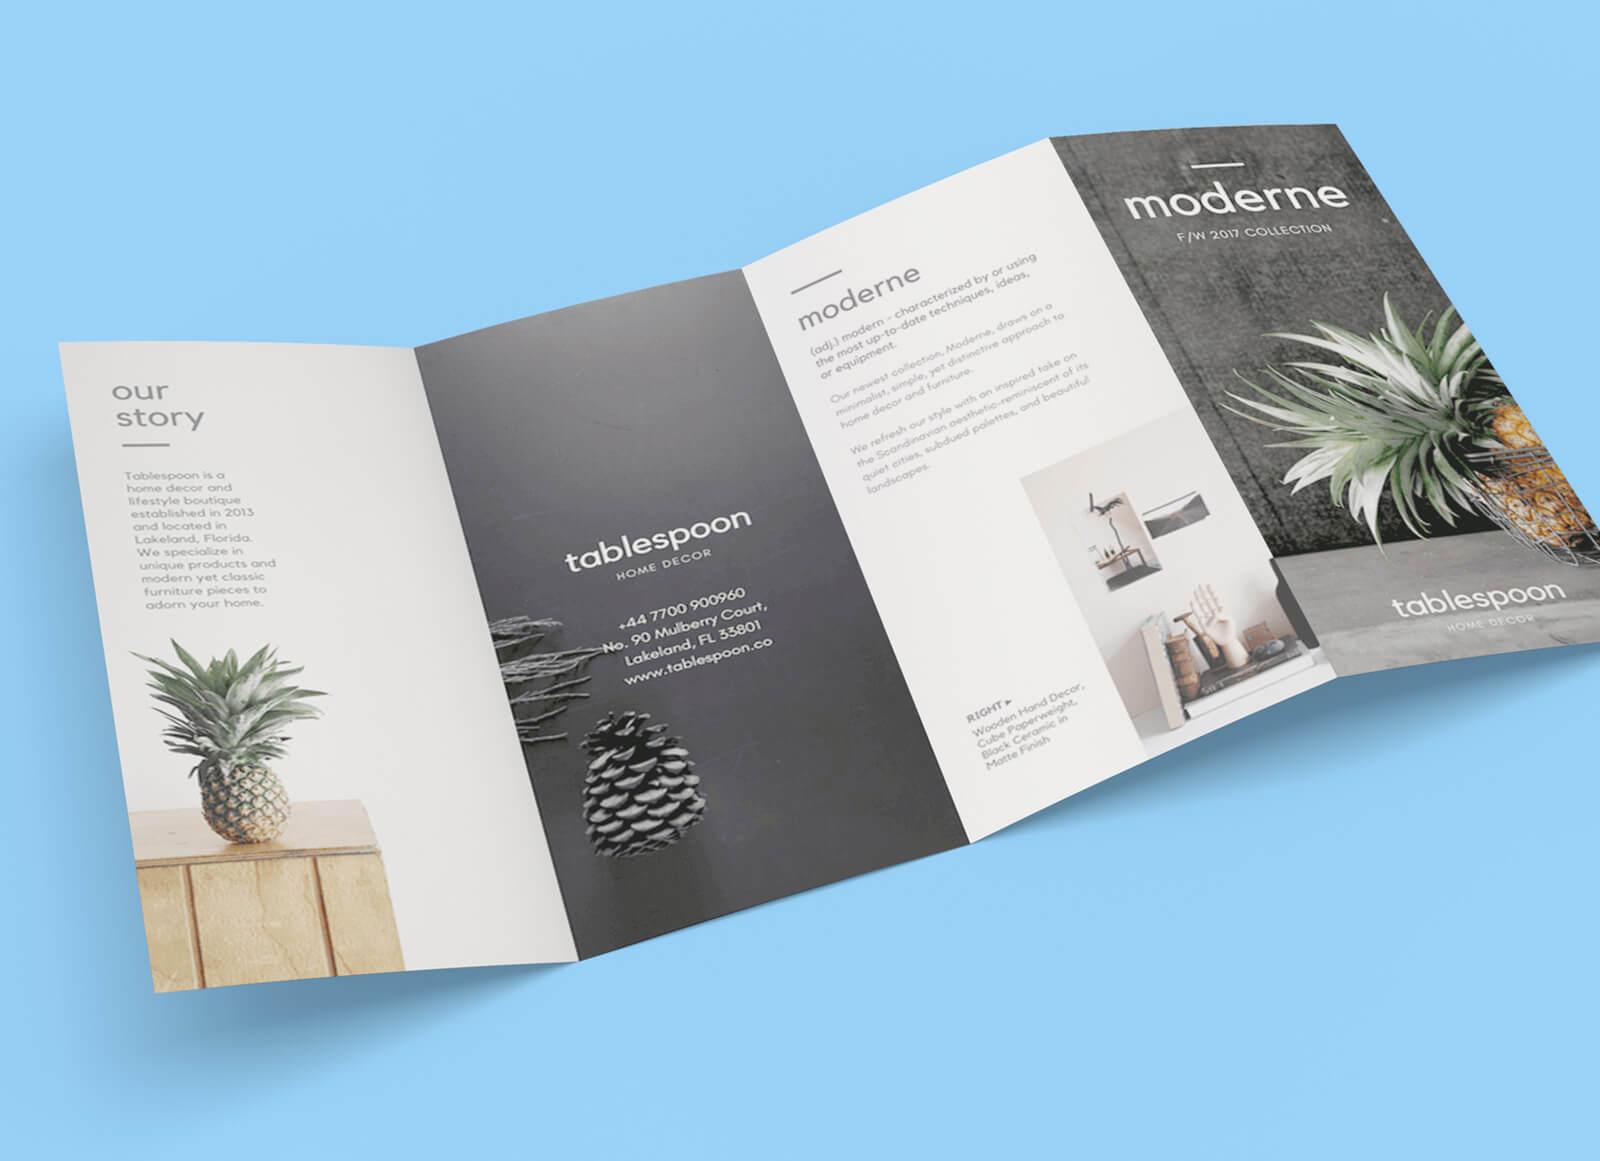 004 Free Panel Quad Fold Brochure Mockup Psd File Template With Regard To 4 Fold Brochure Template Word